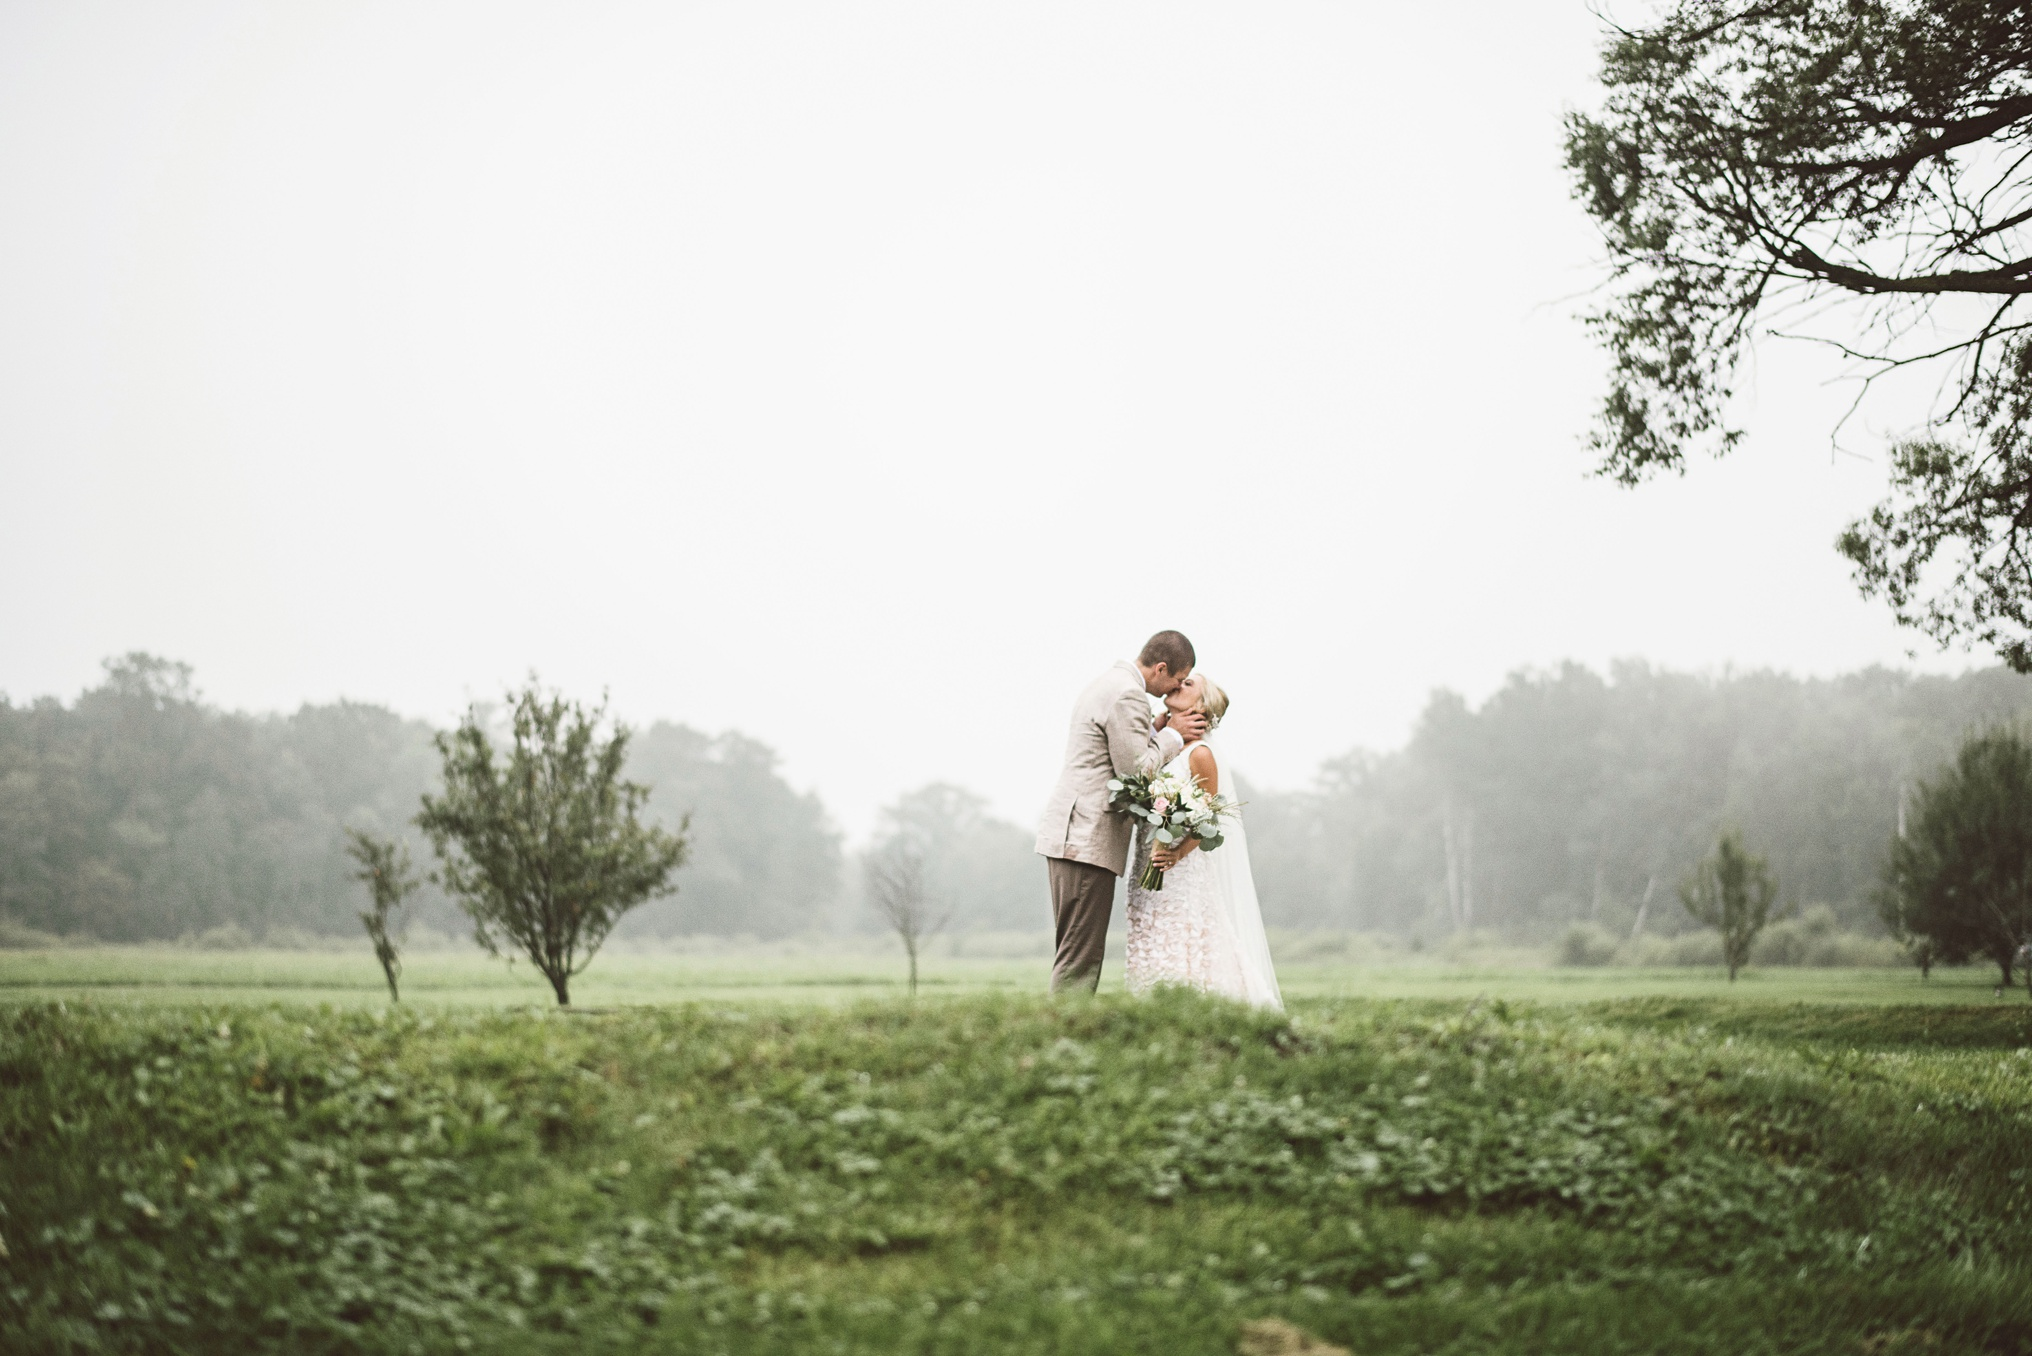 best_wedding_photography_2017_by_lucas_botz_photography_159.jpg